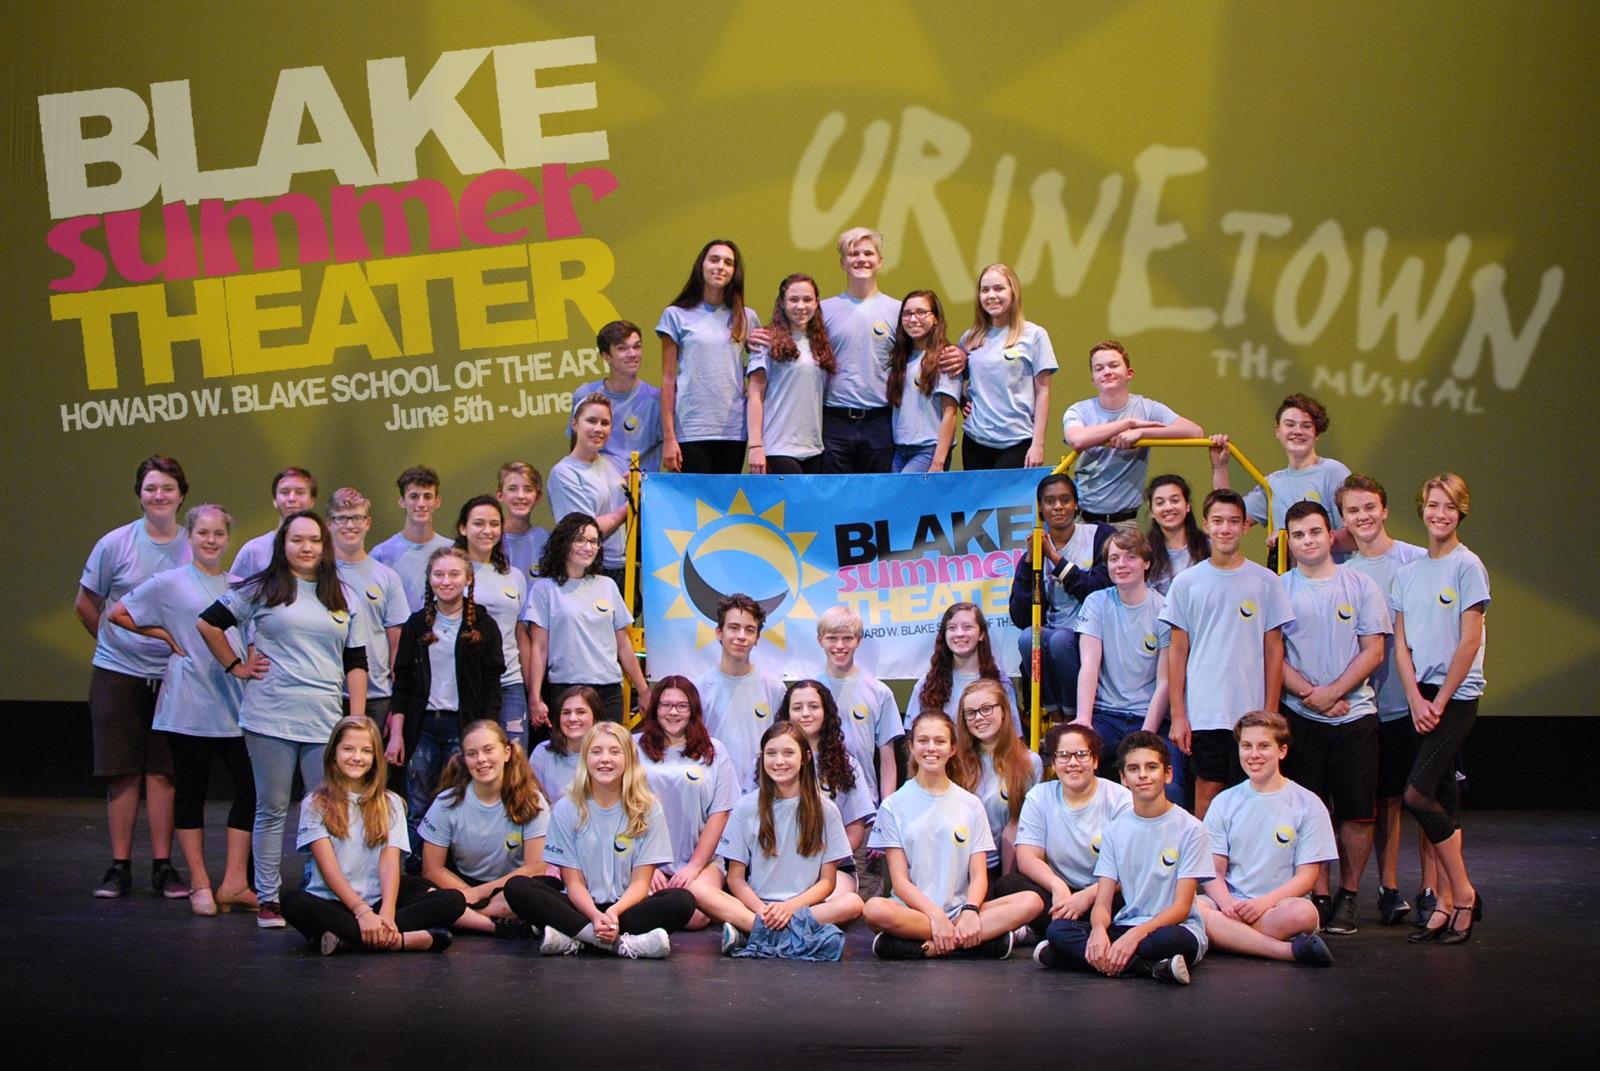 blake-camp-shopped-2.jpg